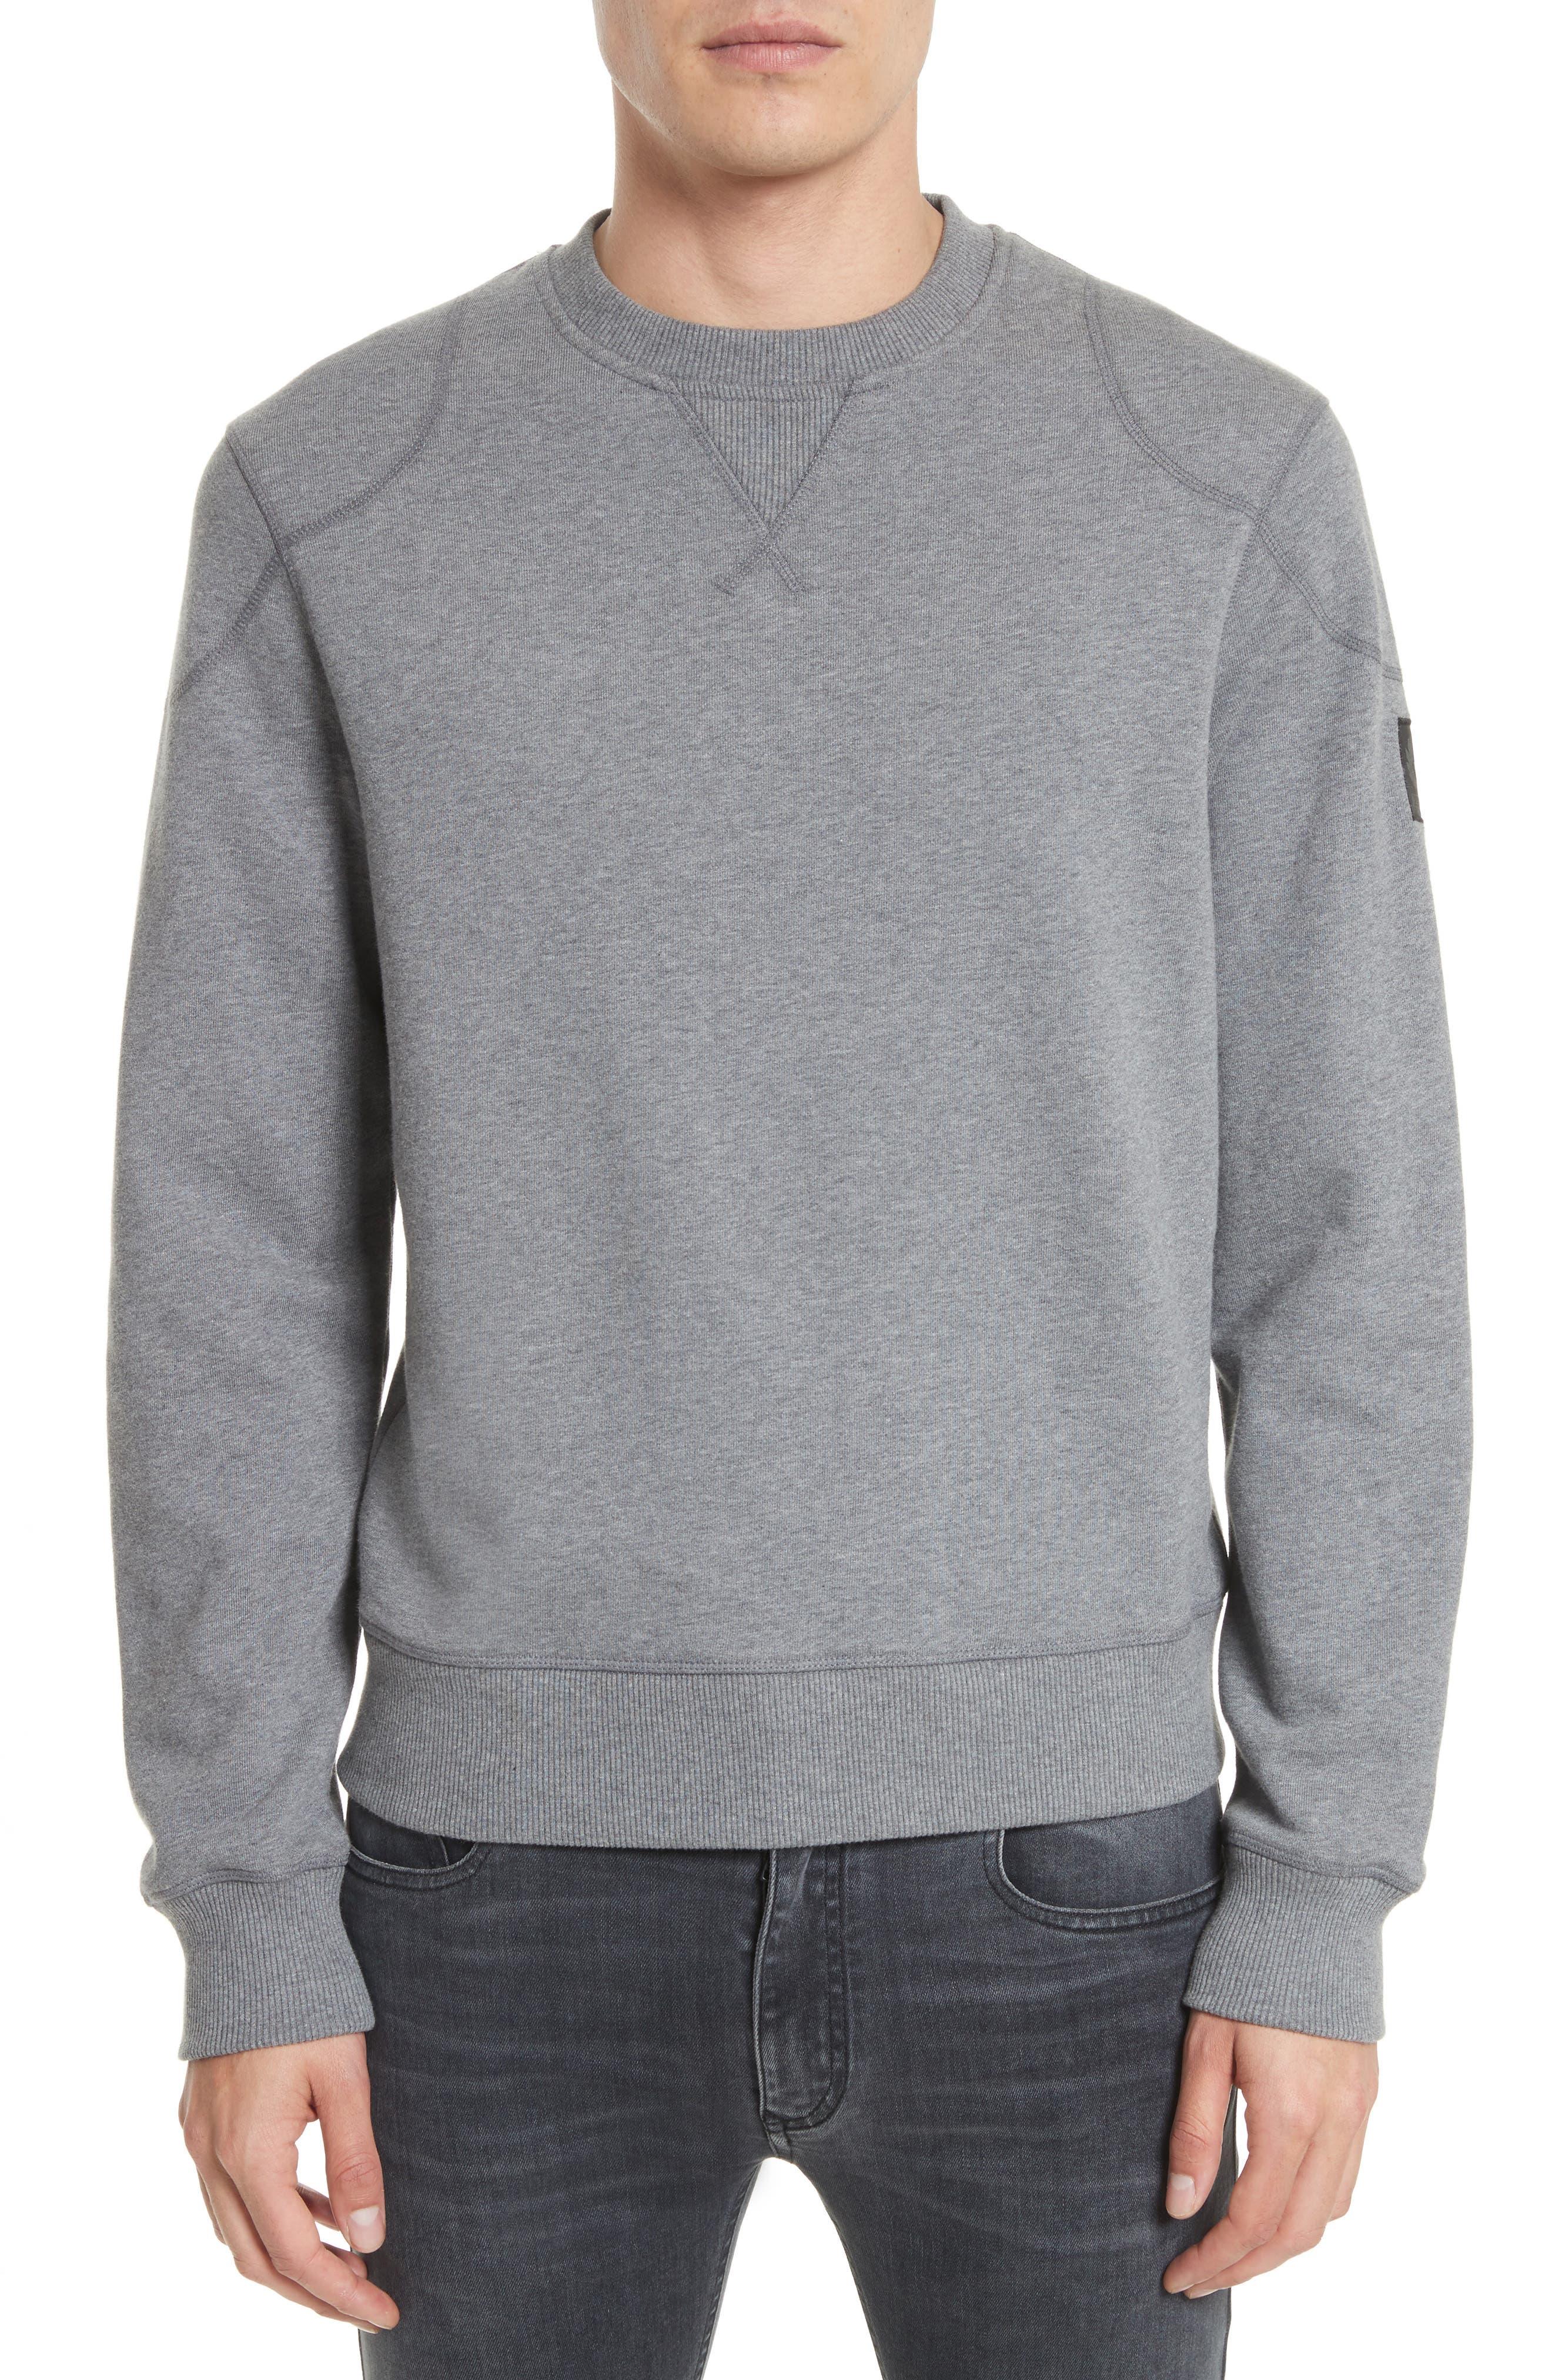 Jefferson Fleece Sweatshirt,                         Main,                         color, 020